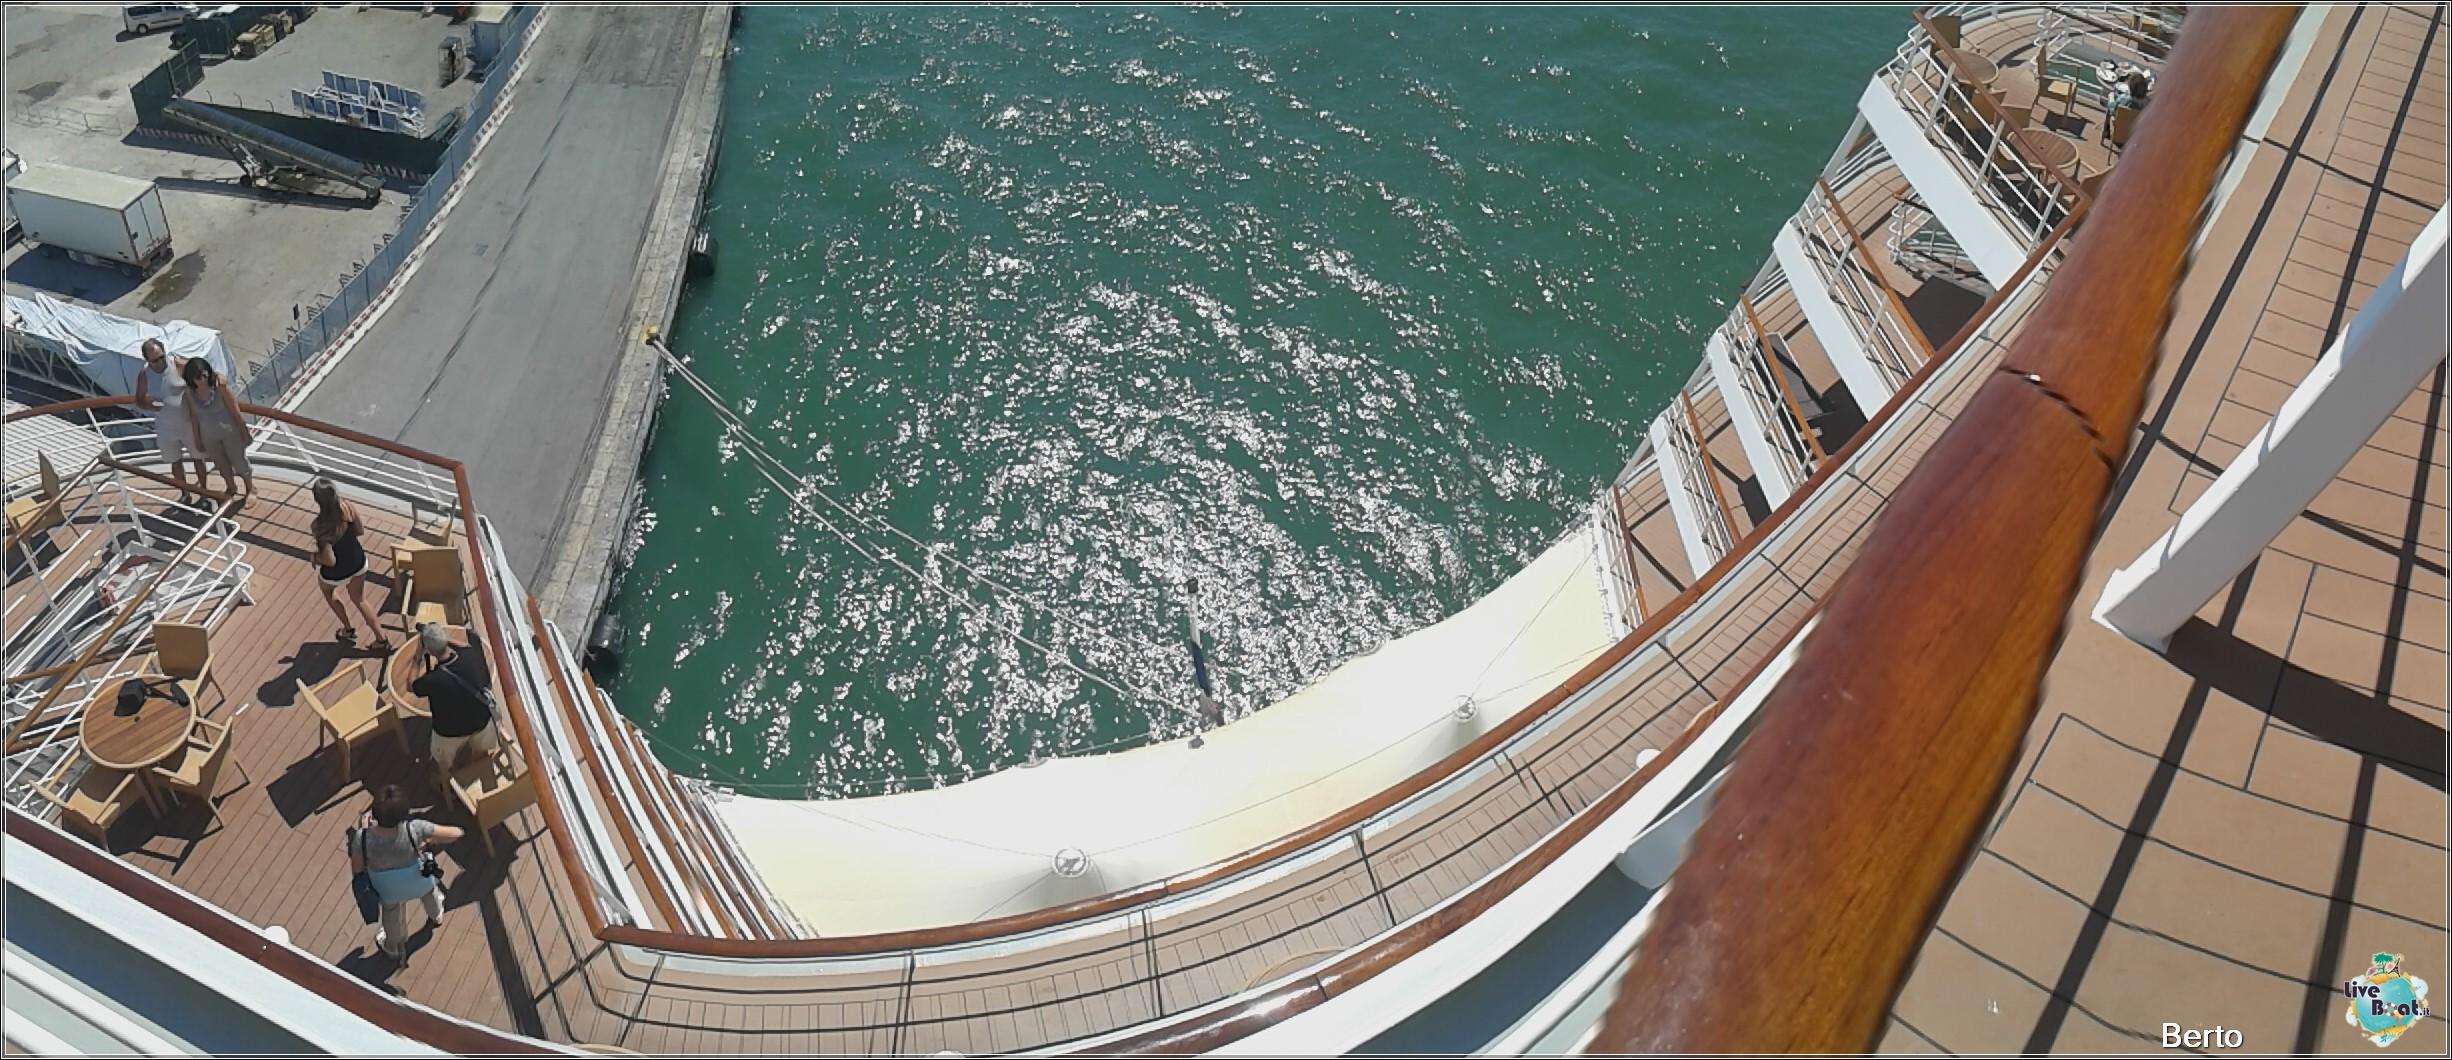 Linea esterna ed esterni di Msc Armonia-108msc-armonia-venezia-liveboatcrociere-jpg